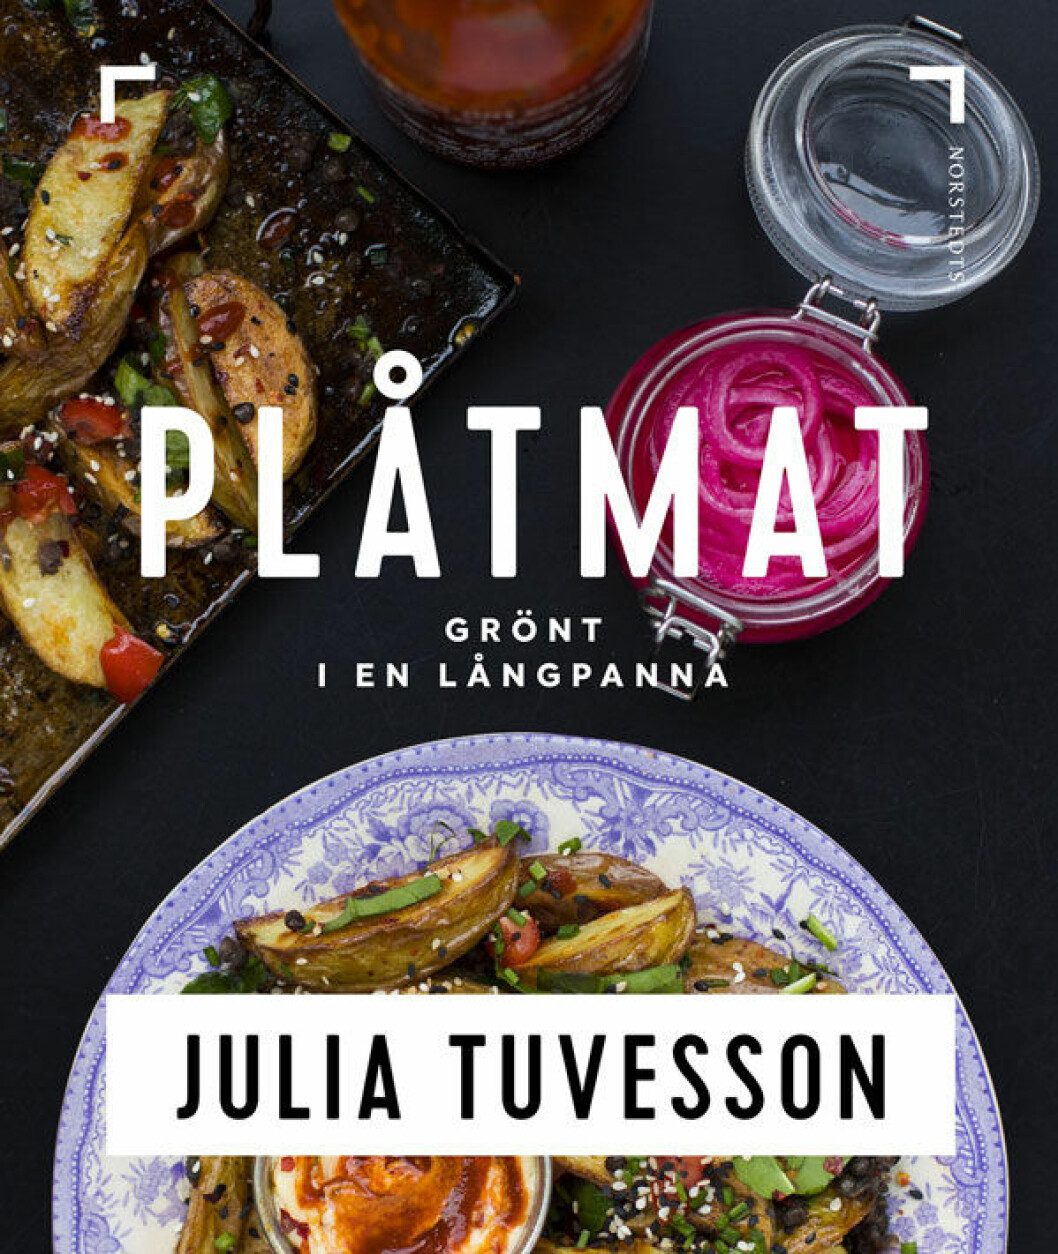 Kokboken Plåtmat av Julia Tuvesson.